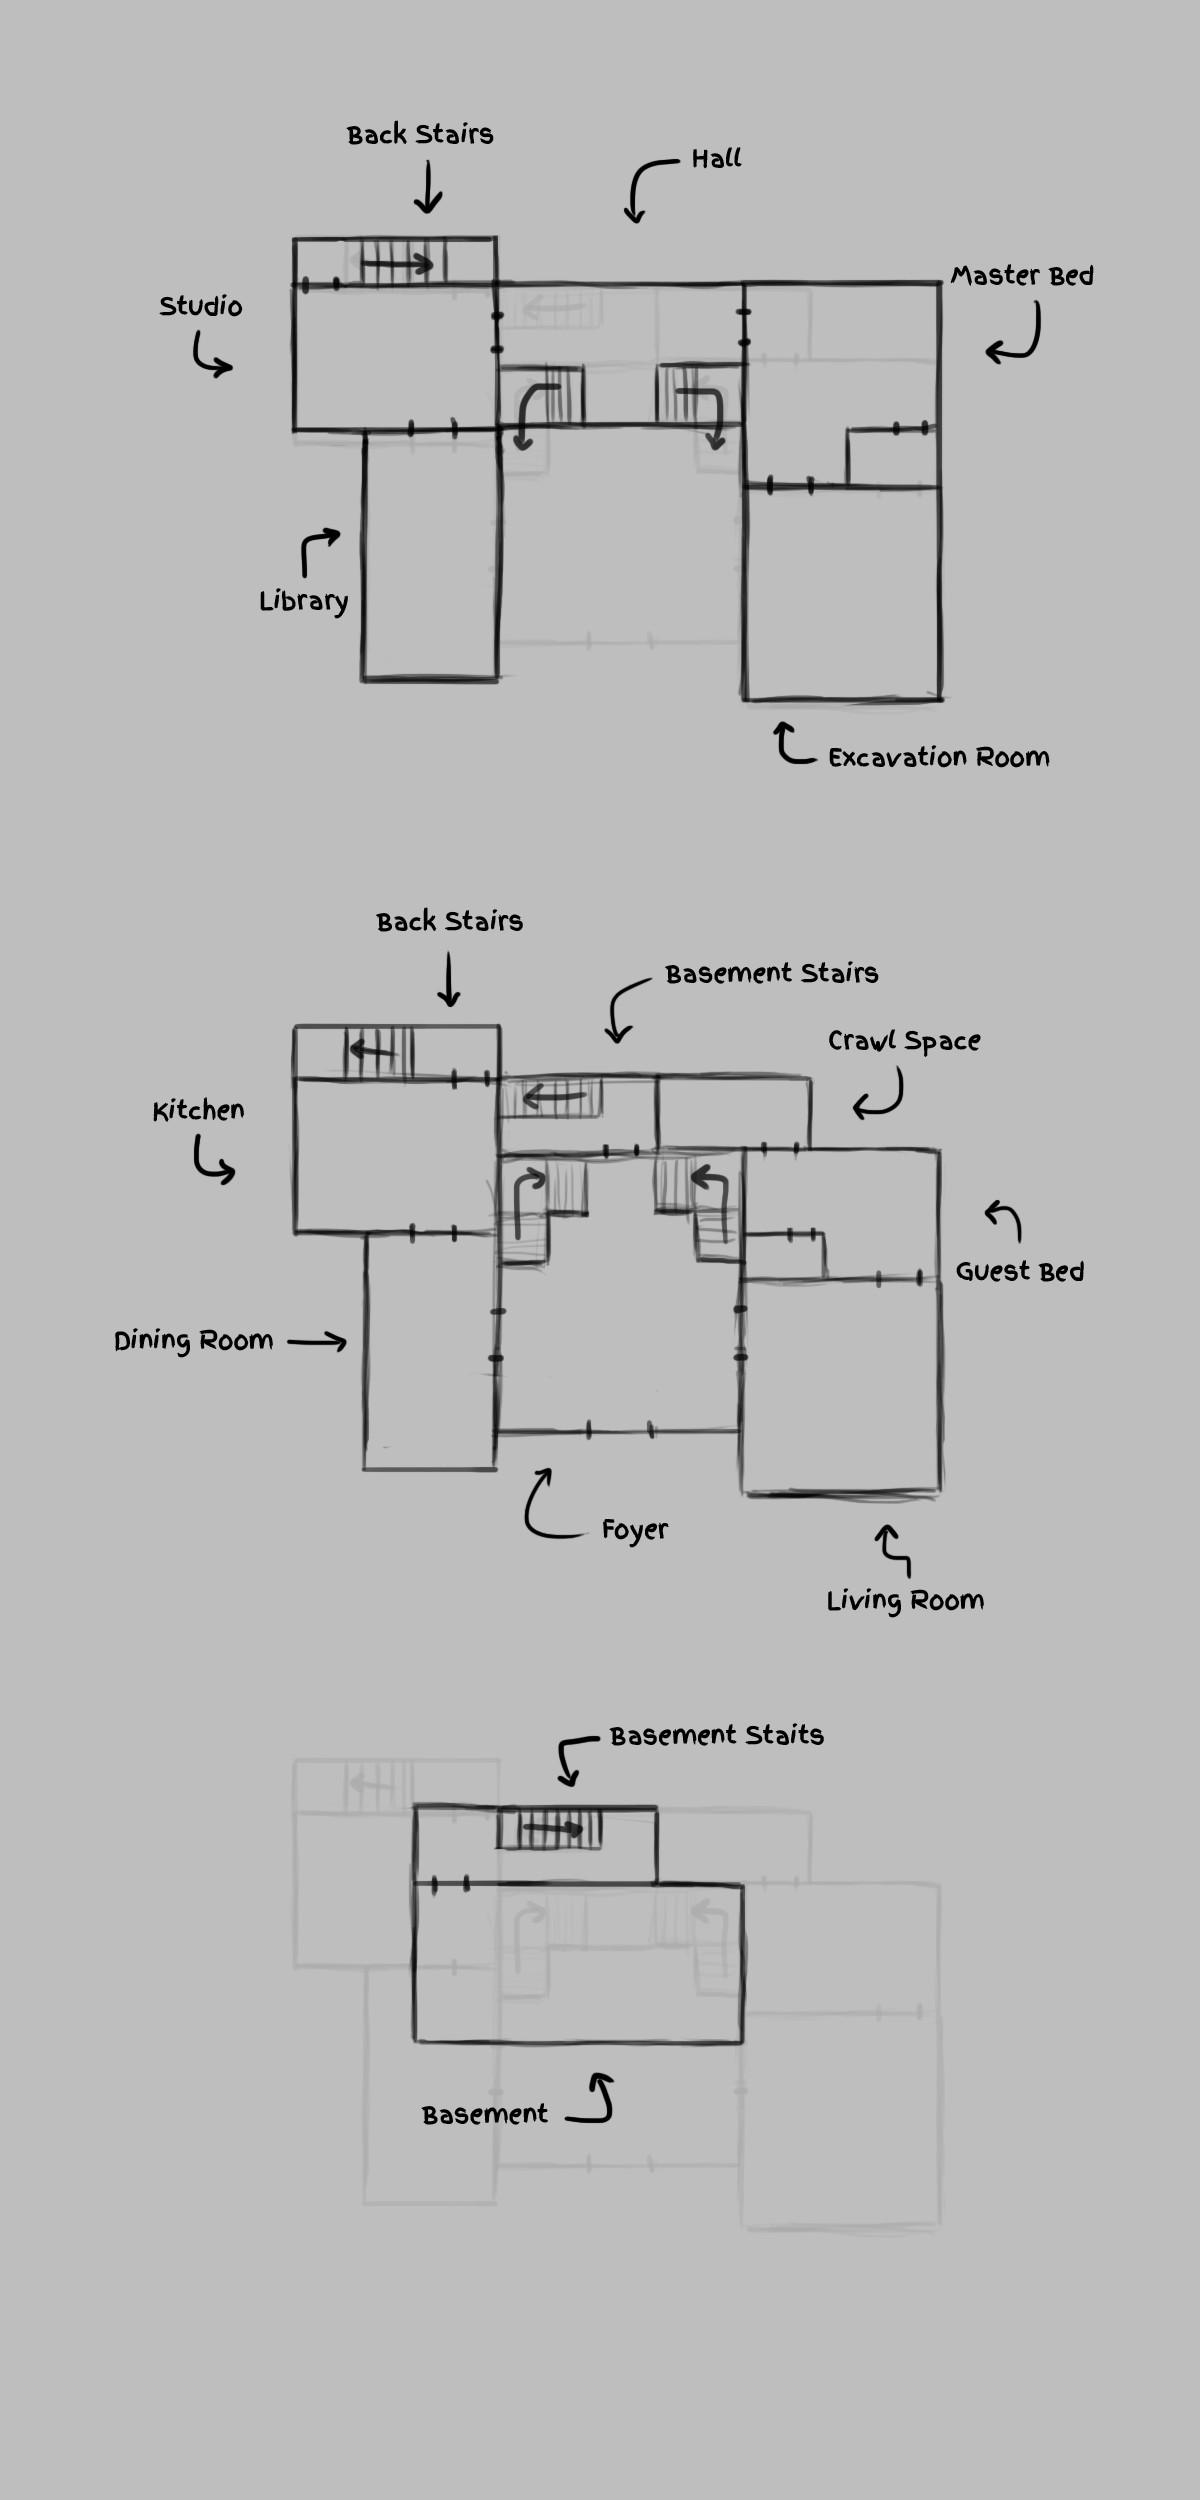 Ben kalicky floorplanwip